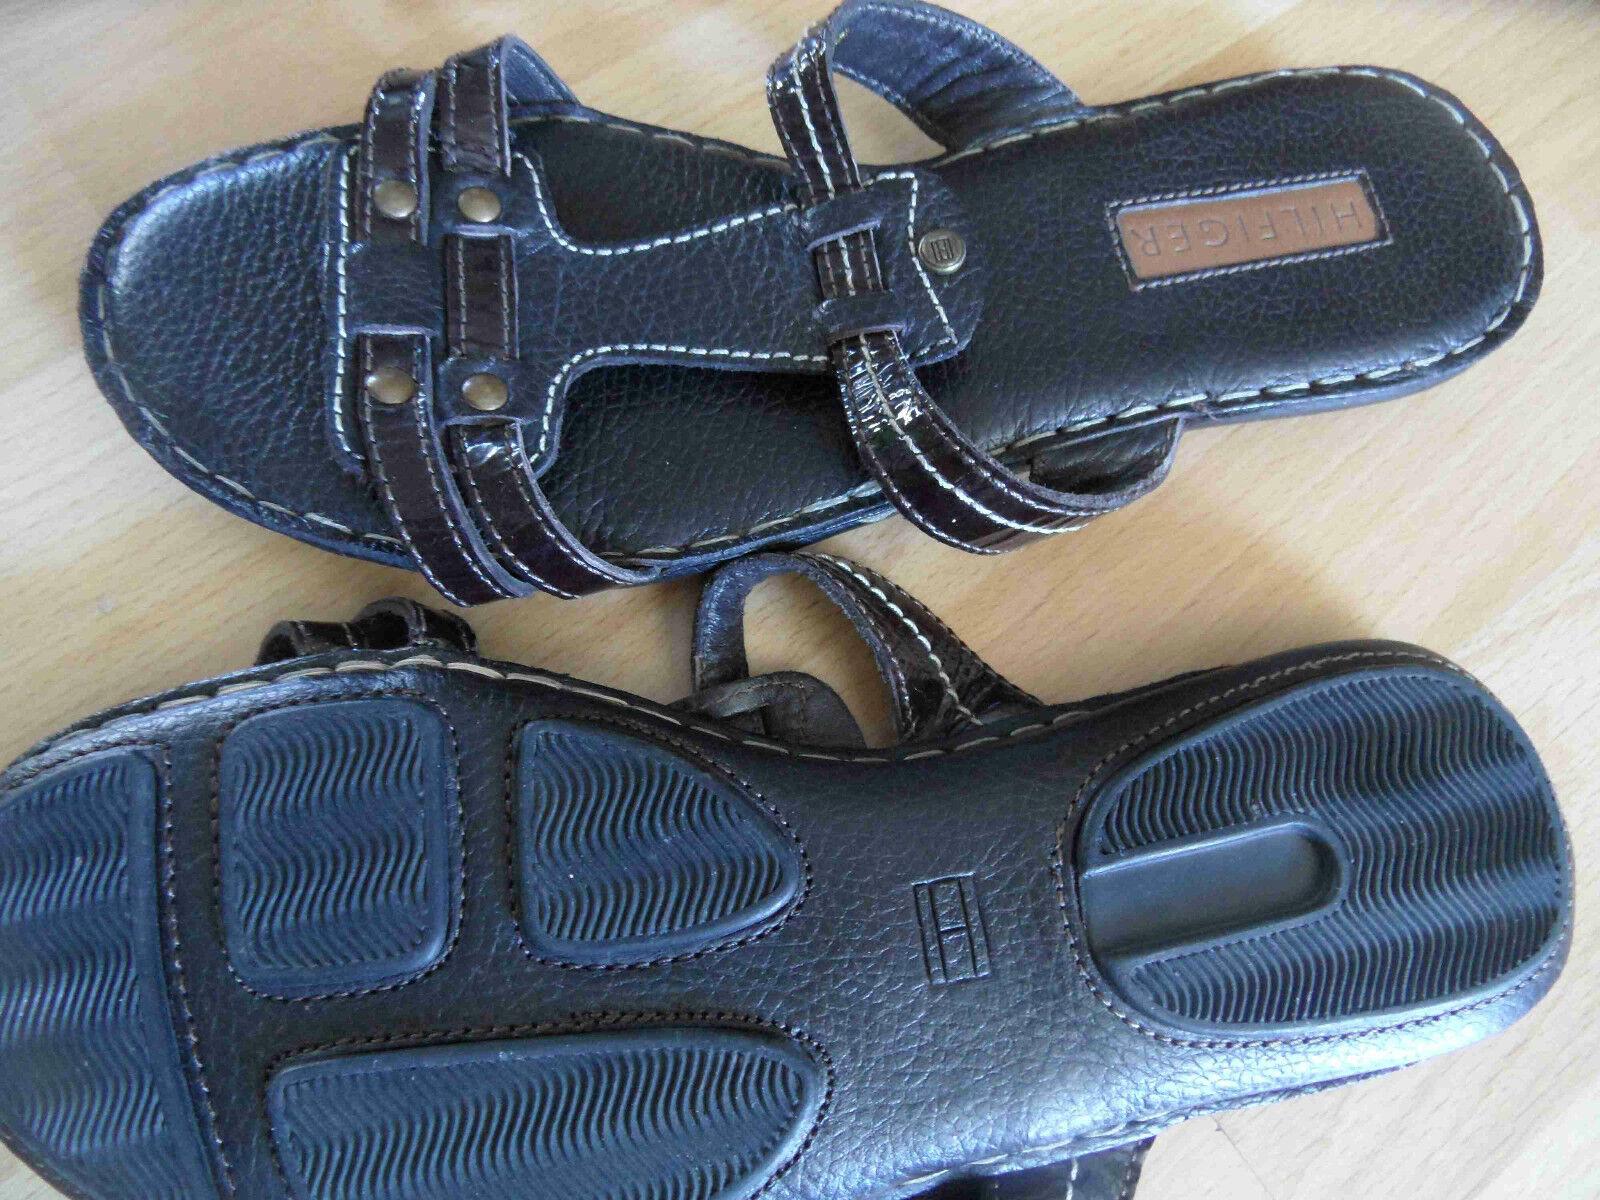 HILFIGER schöne Leder Sandaletten braun Gr. 39   (PN 714)